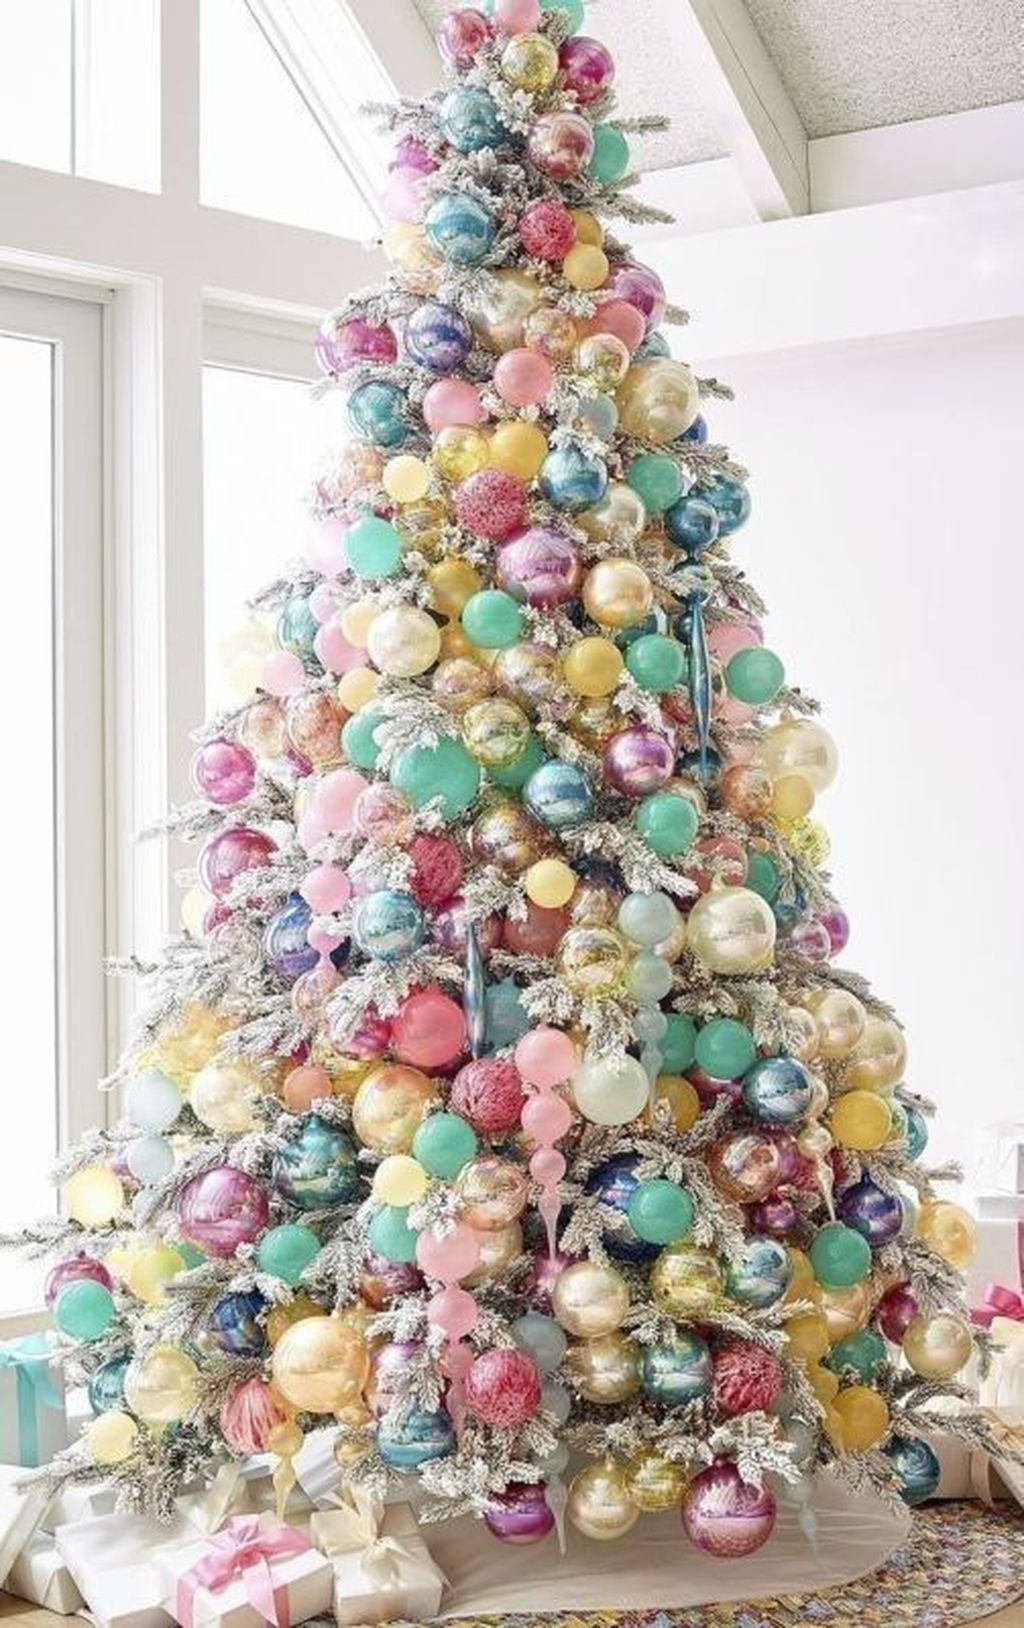 Amazing Winter Christmas Tree Design And Decor Ideas 12